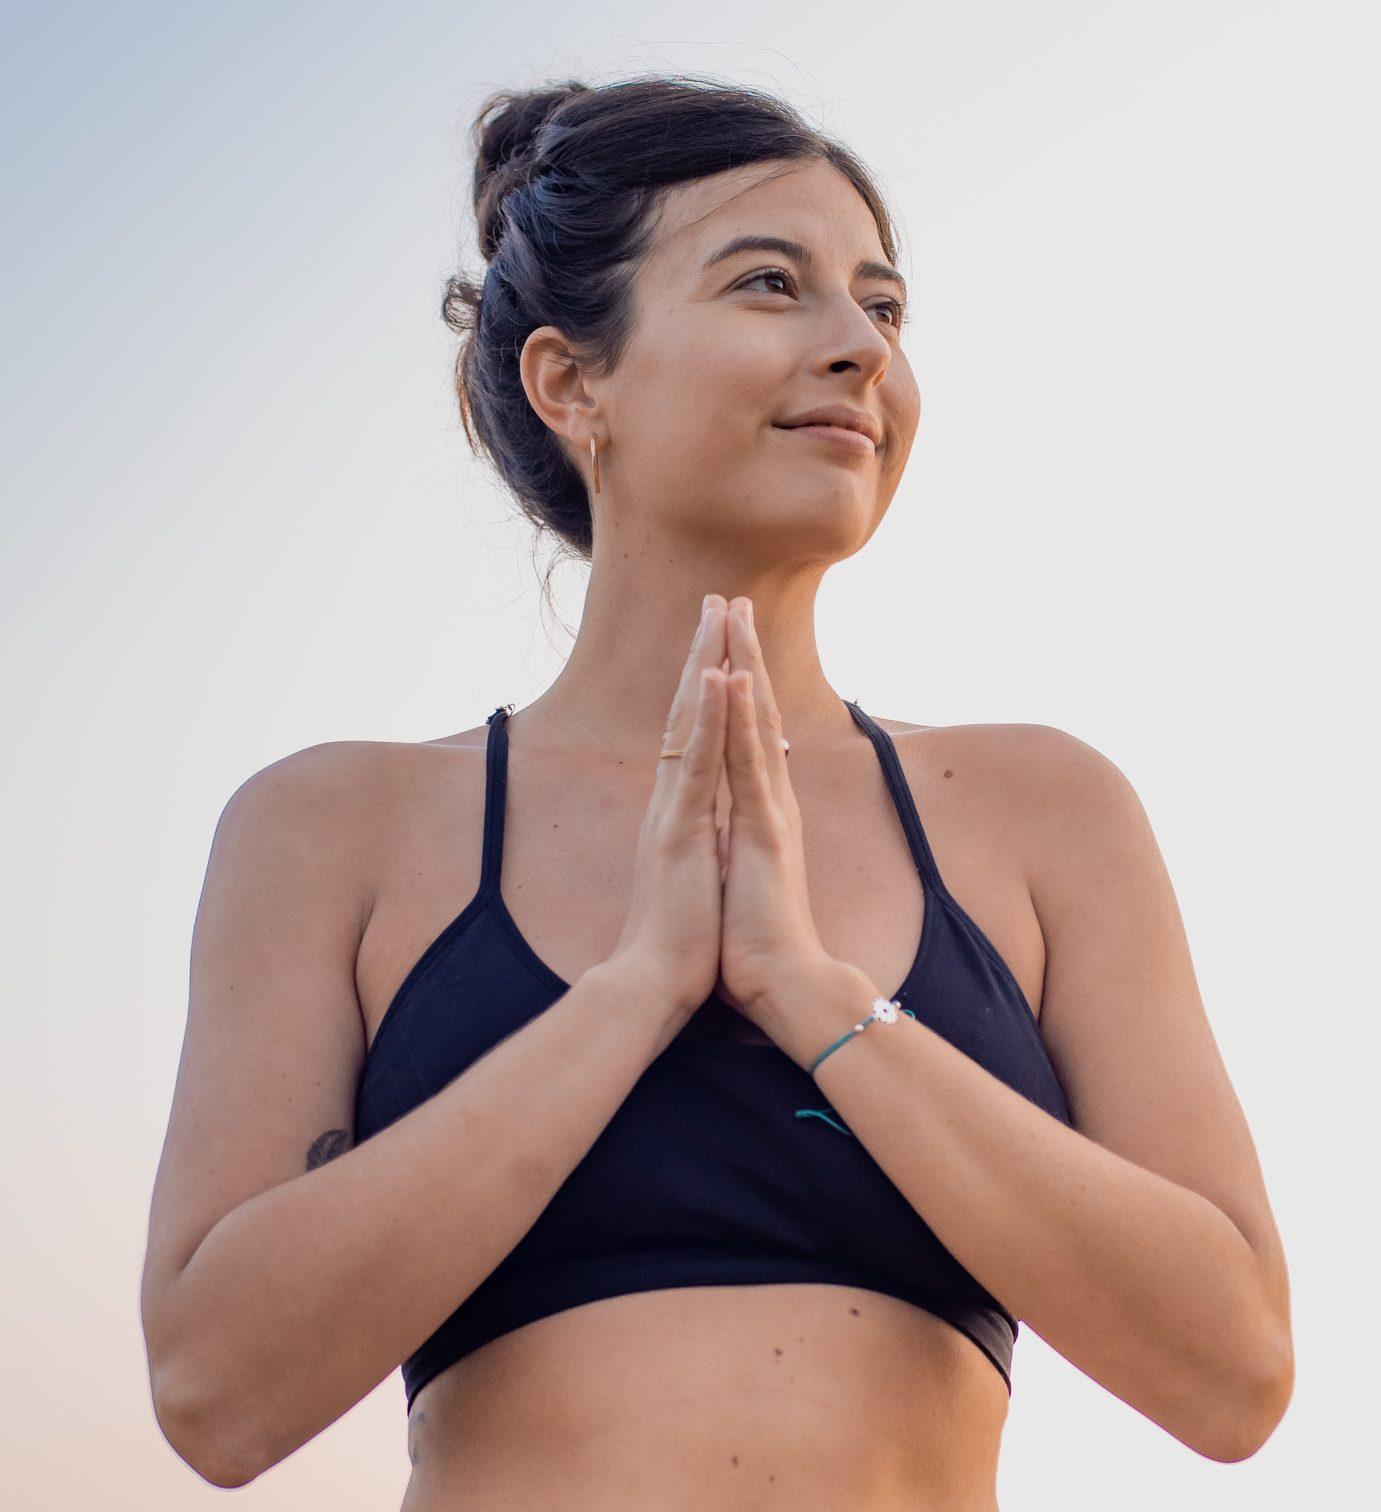 Emma Arscott - yoga teacher - YOAS - Yoga on a Shoestring